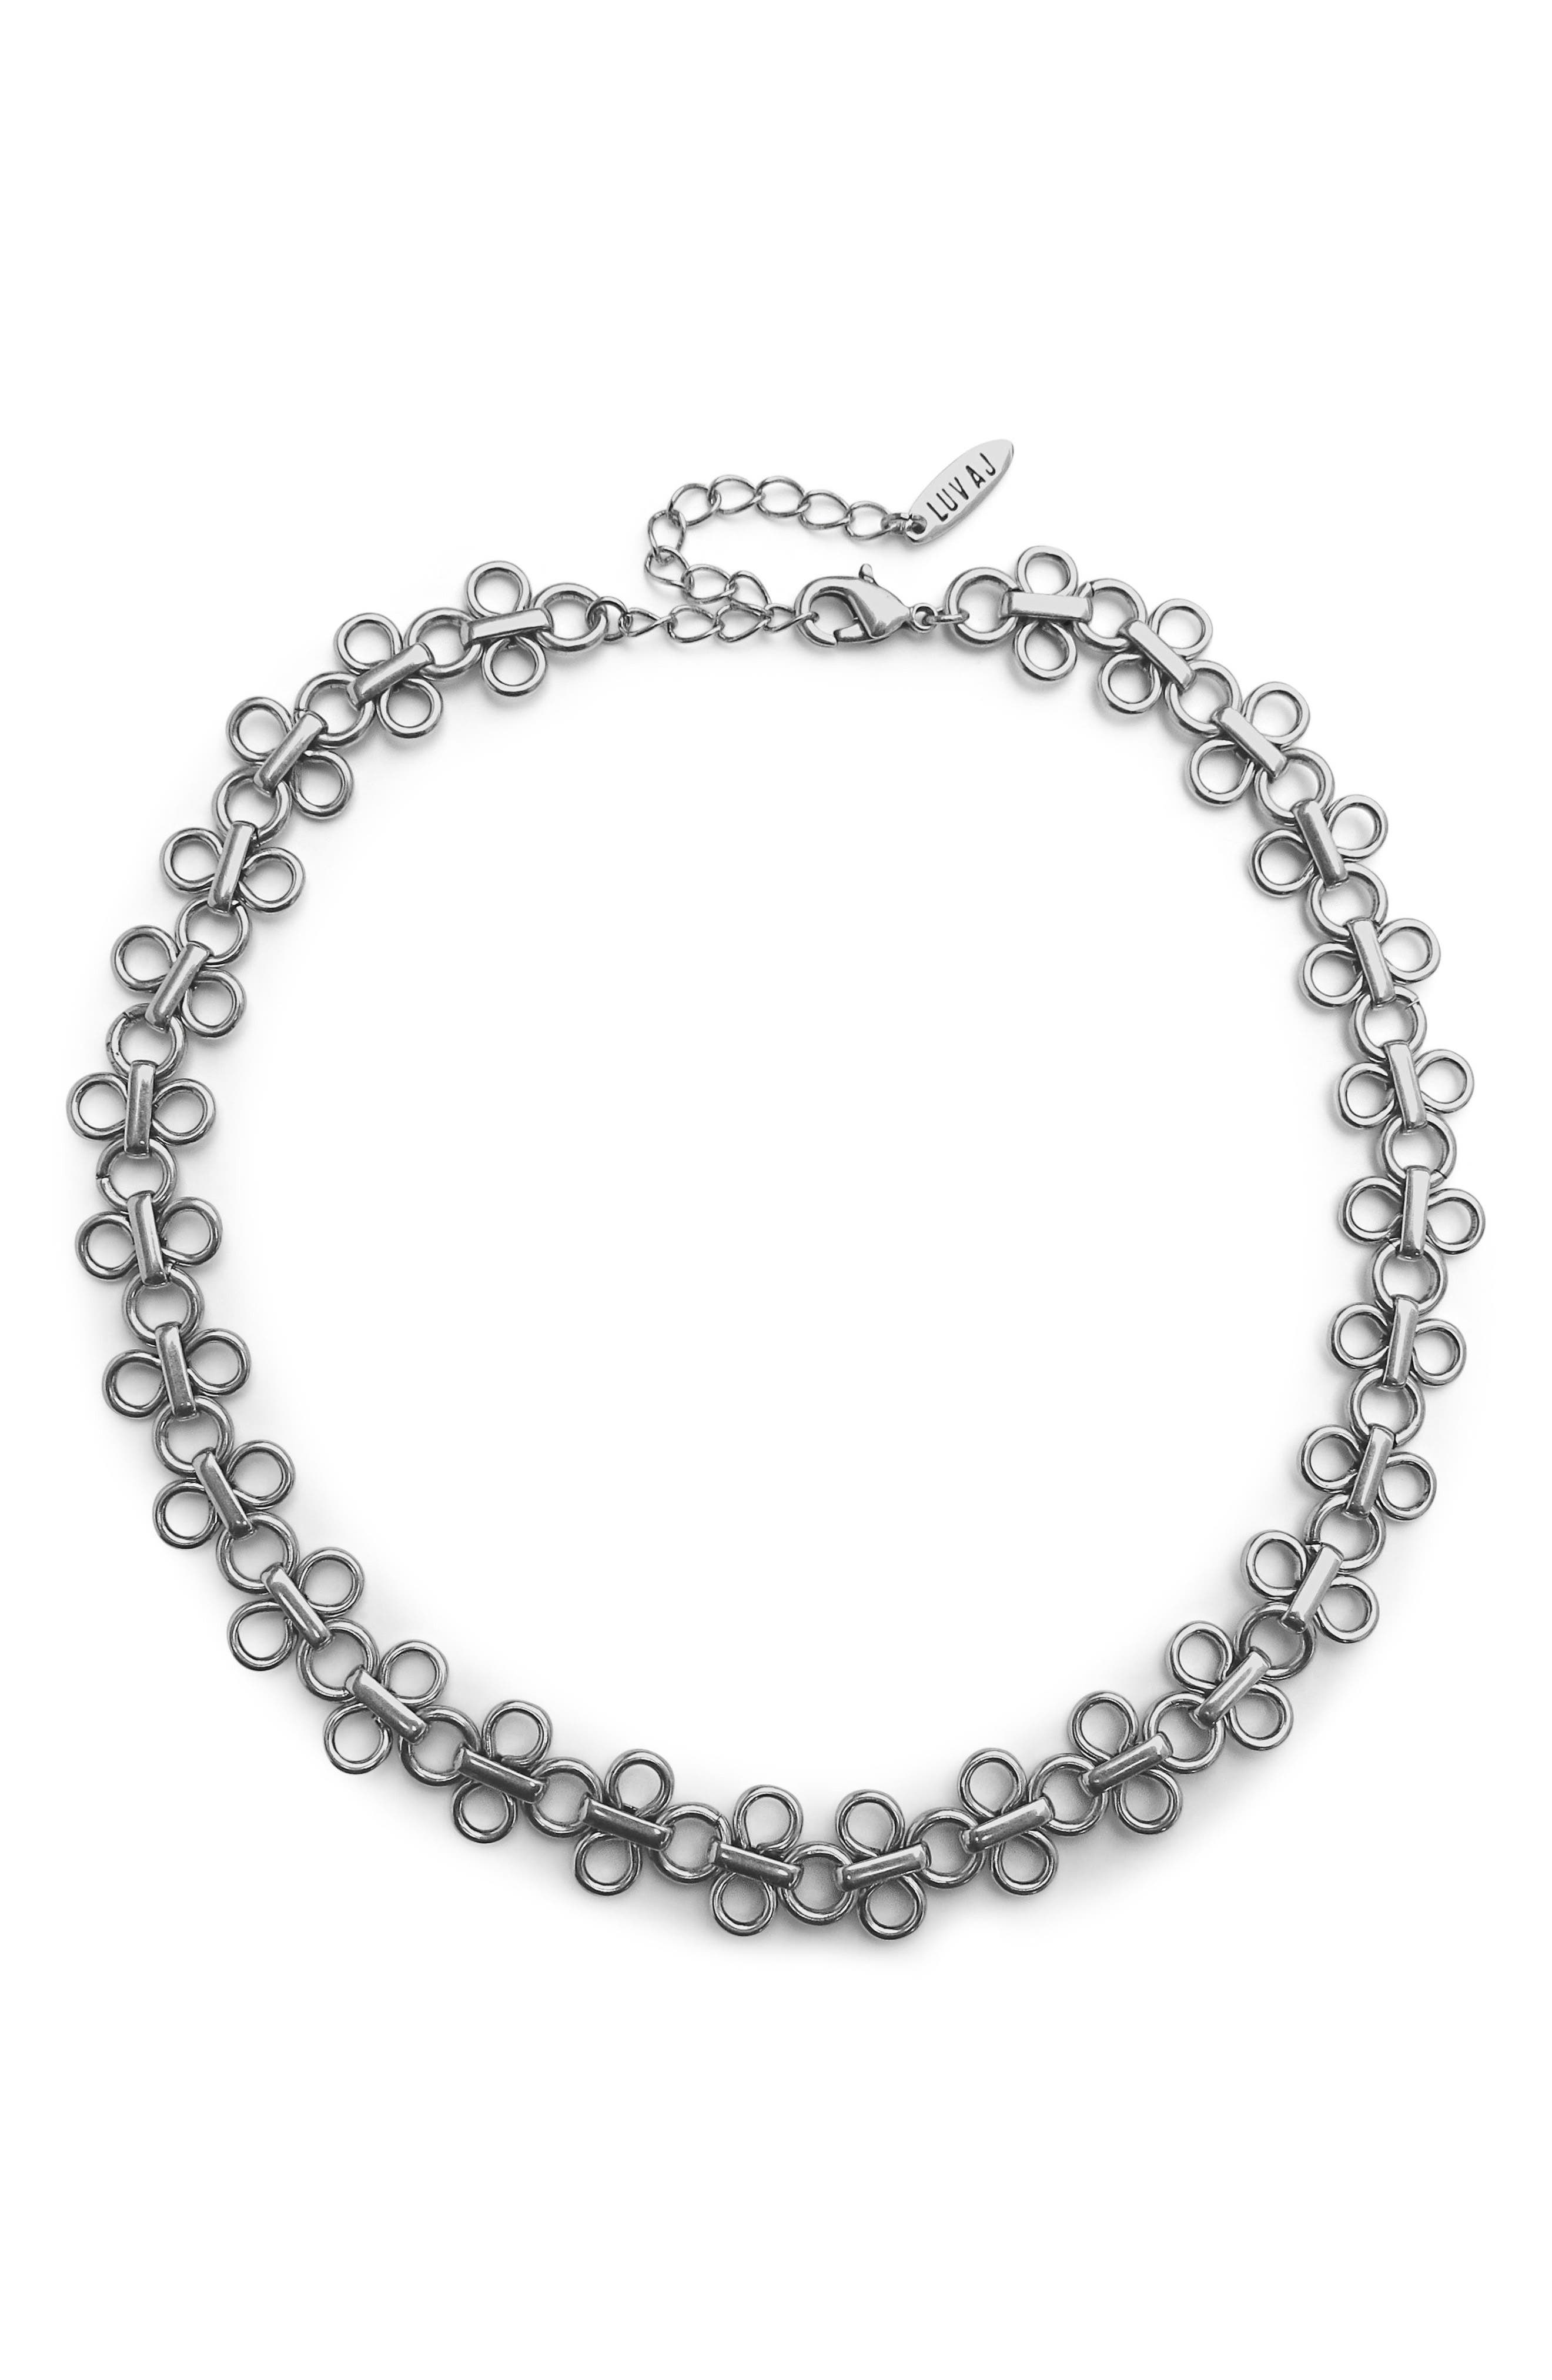 Lace Link Choker Necklace,                             Main thumbnail 1, color,                             040